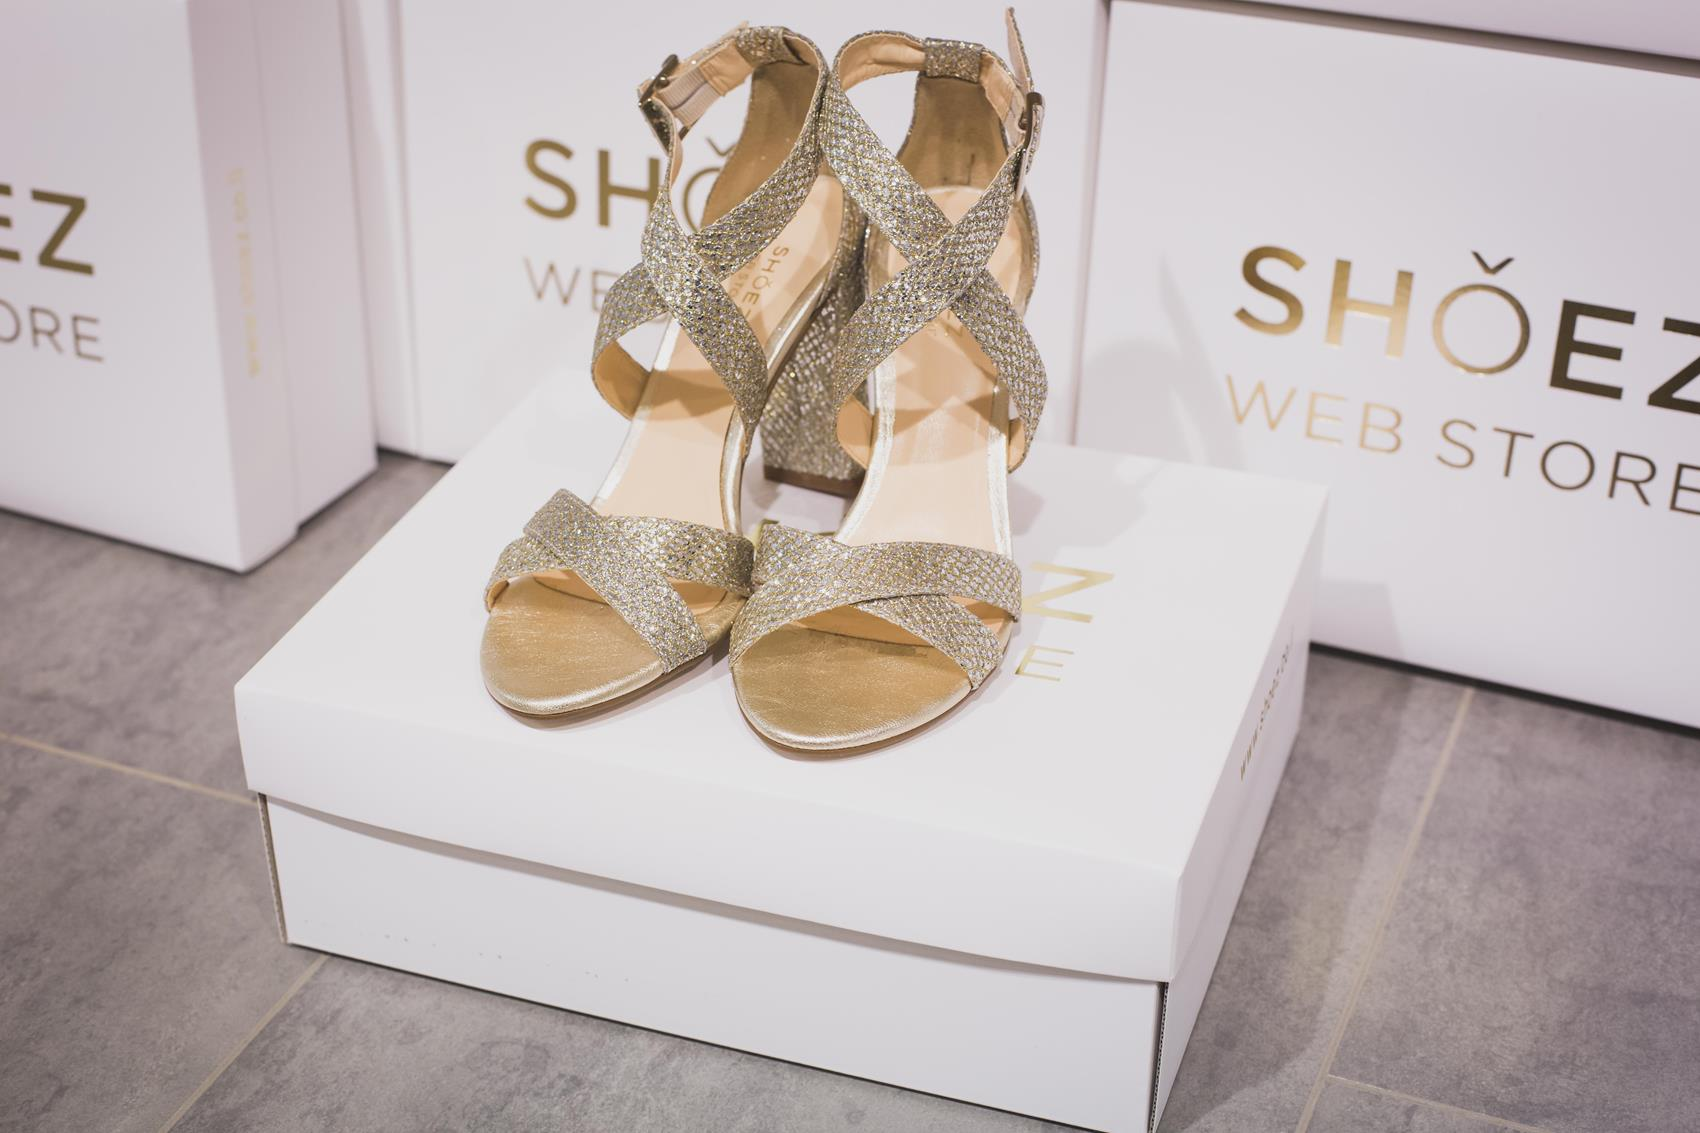 ביקור סטודיו: Shoez Webstore